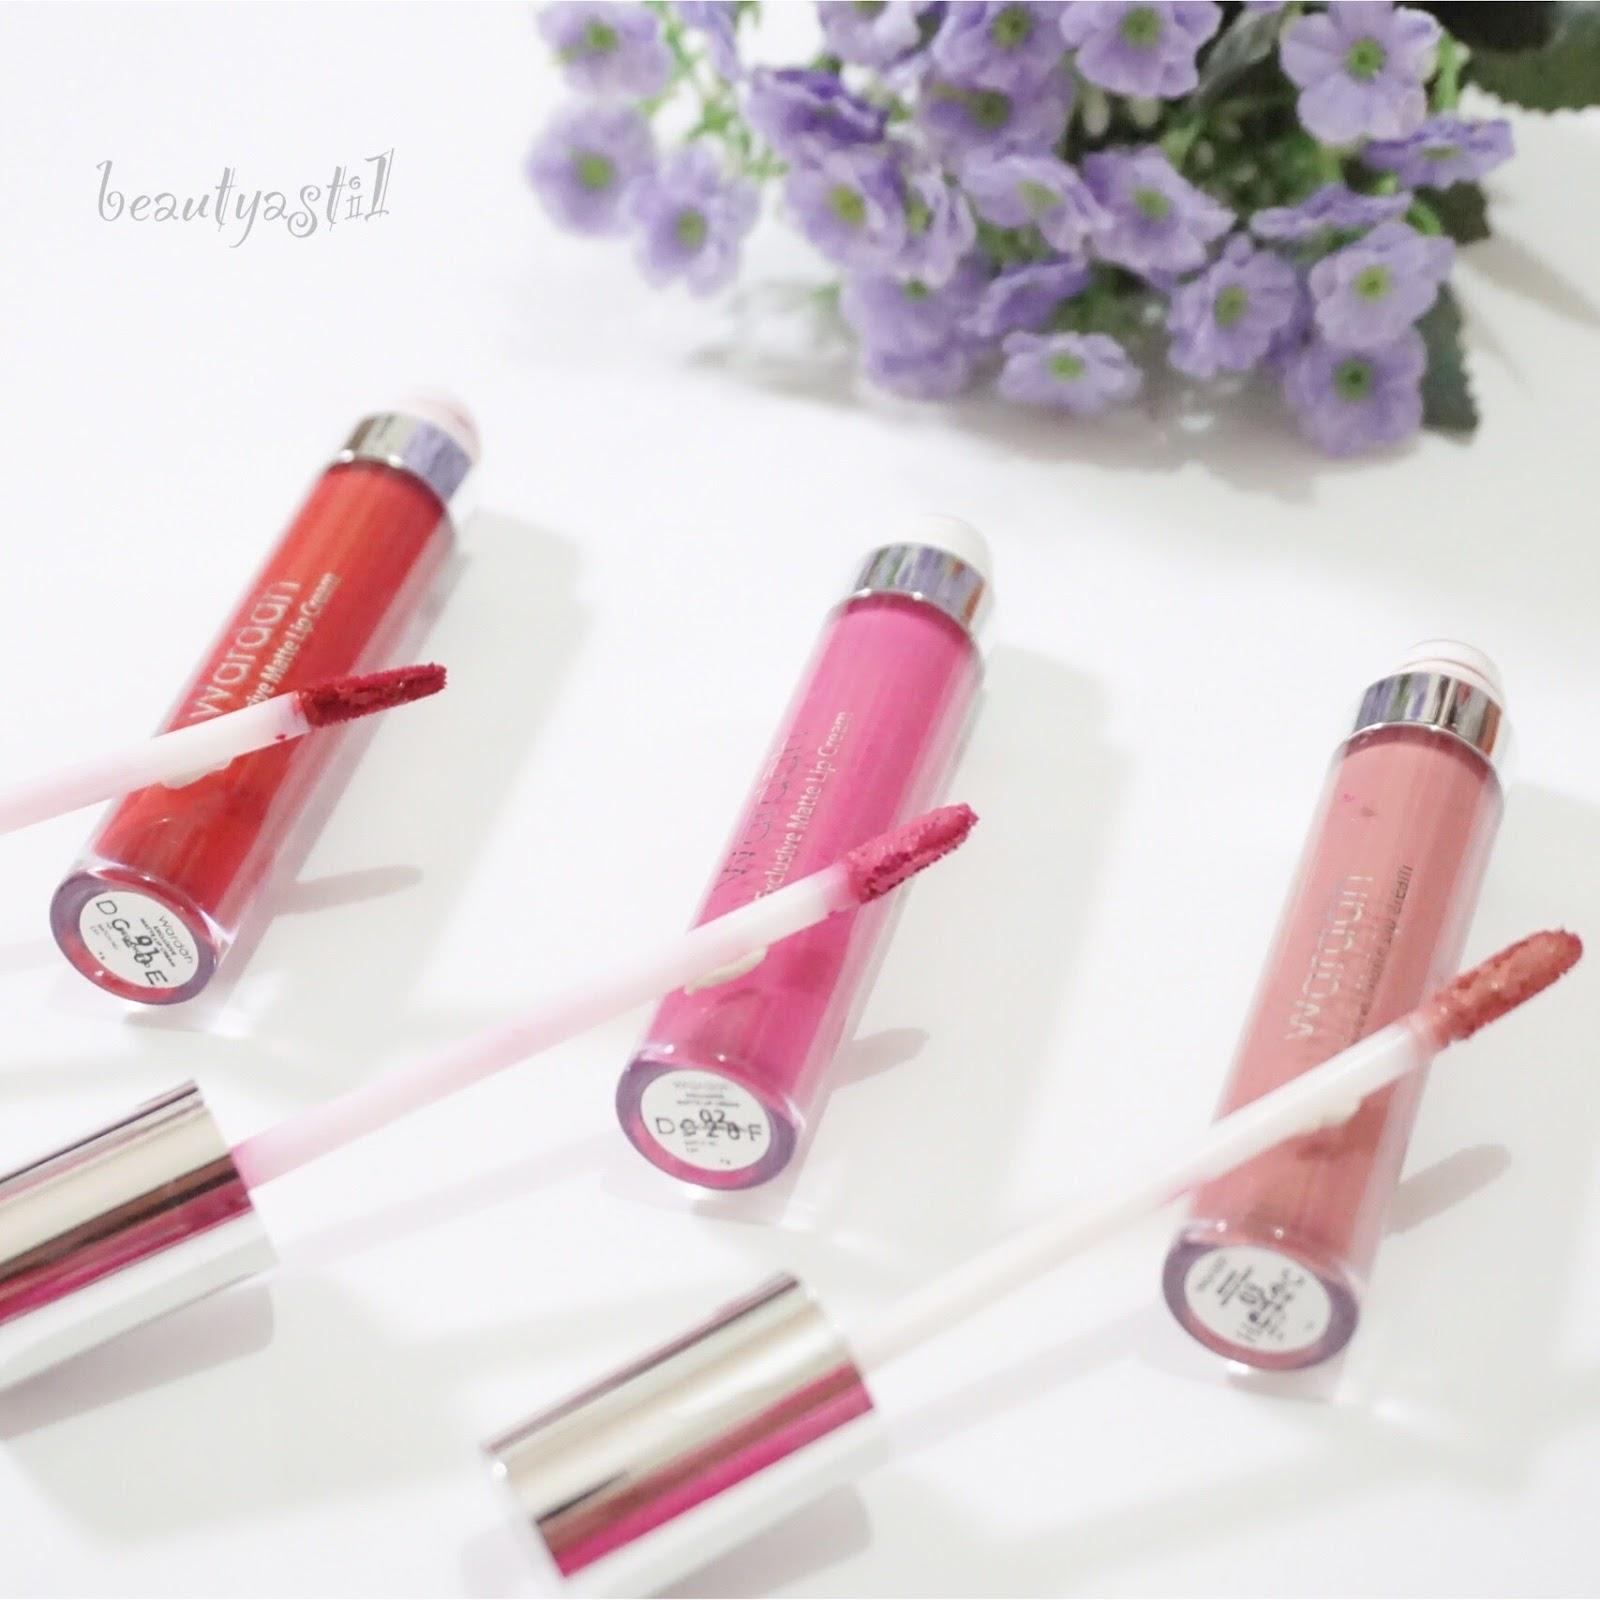 Harga Jual Wardah Exclusive Matte Lip Cream 02 Fuschionately 45000 Lipstick 01 03